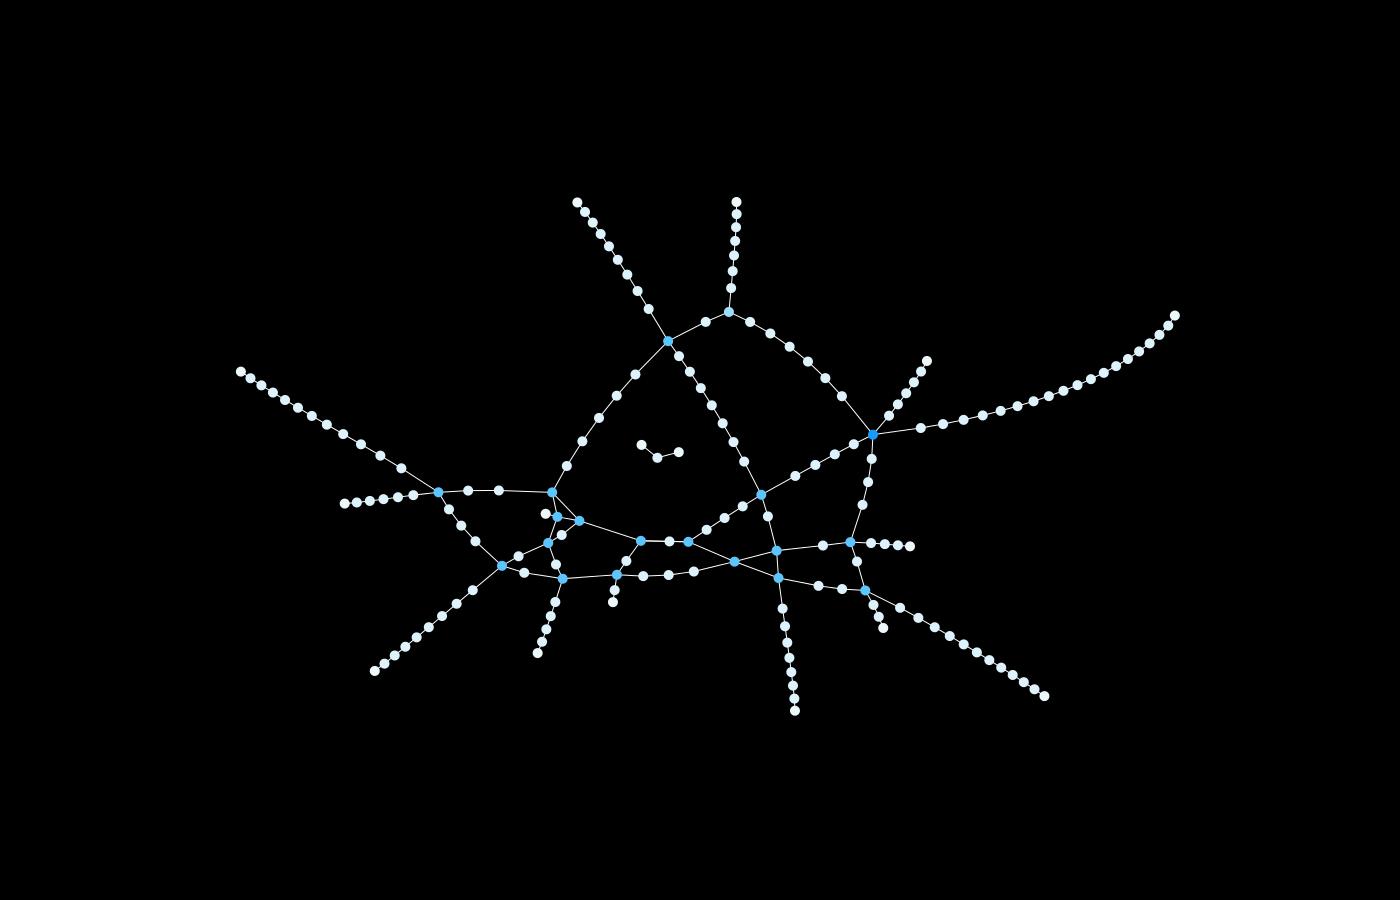 MetroNetwork6